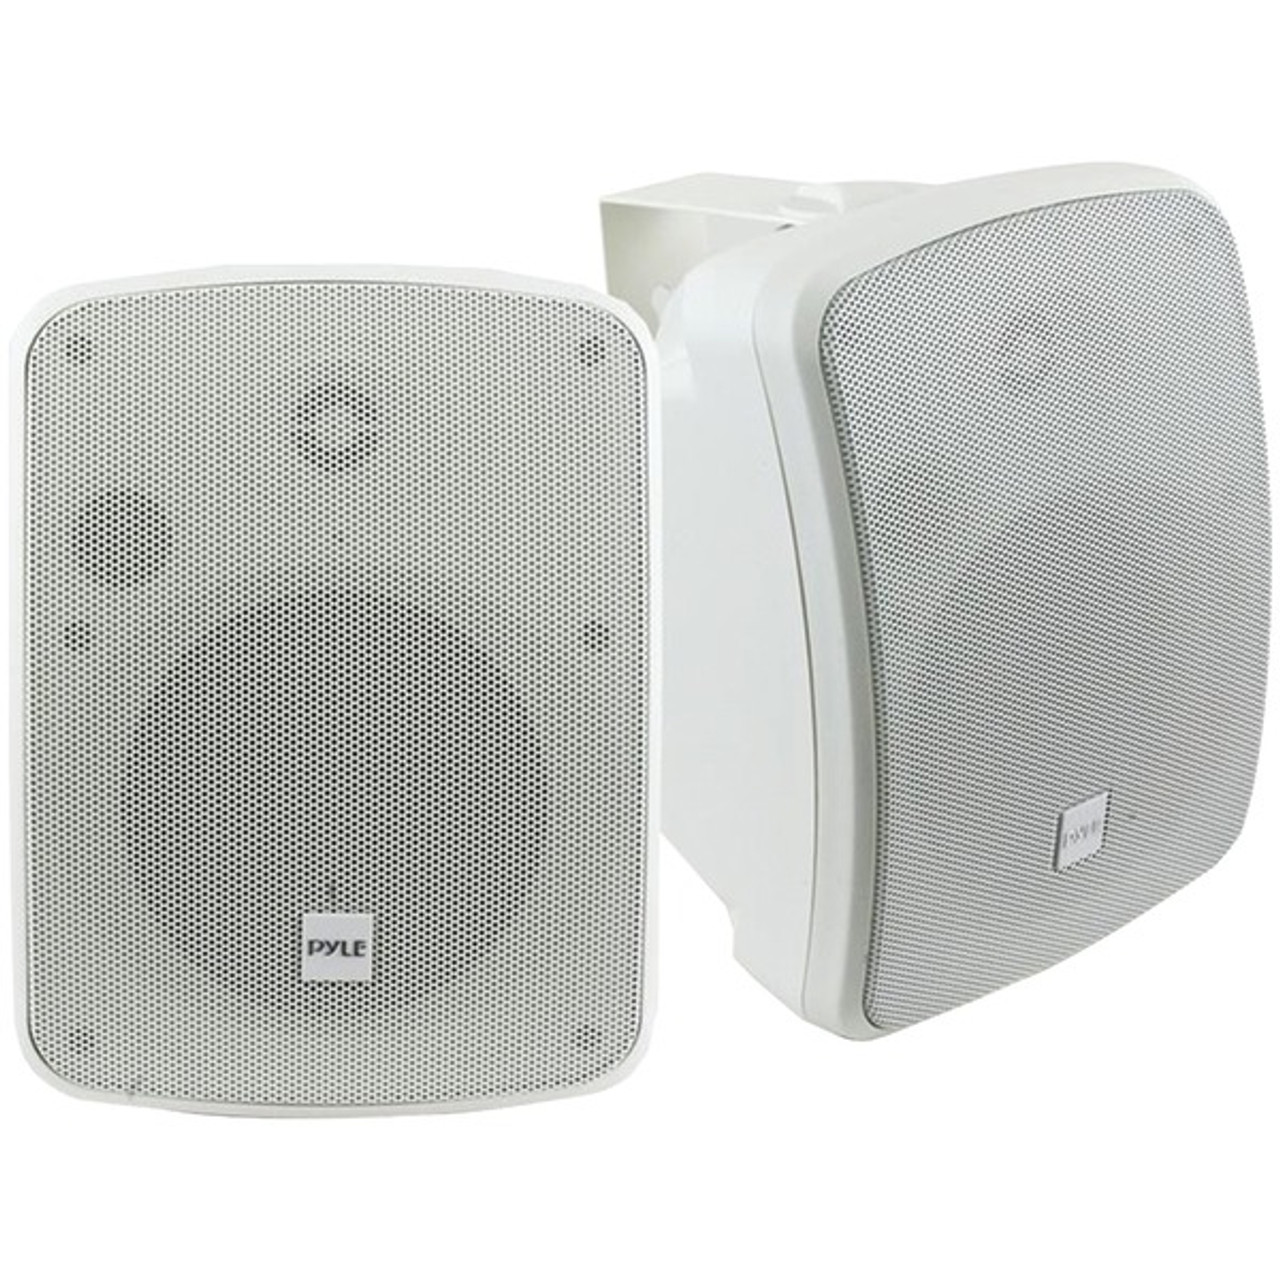 Pair White New Pyle Waterproof Bluetooth 5.25/'/' Indoor//Outdoor Speakers 600W